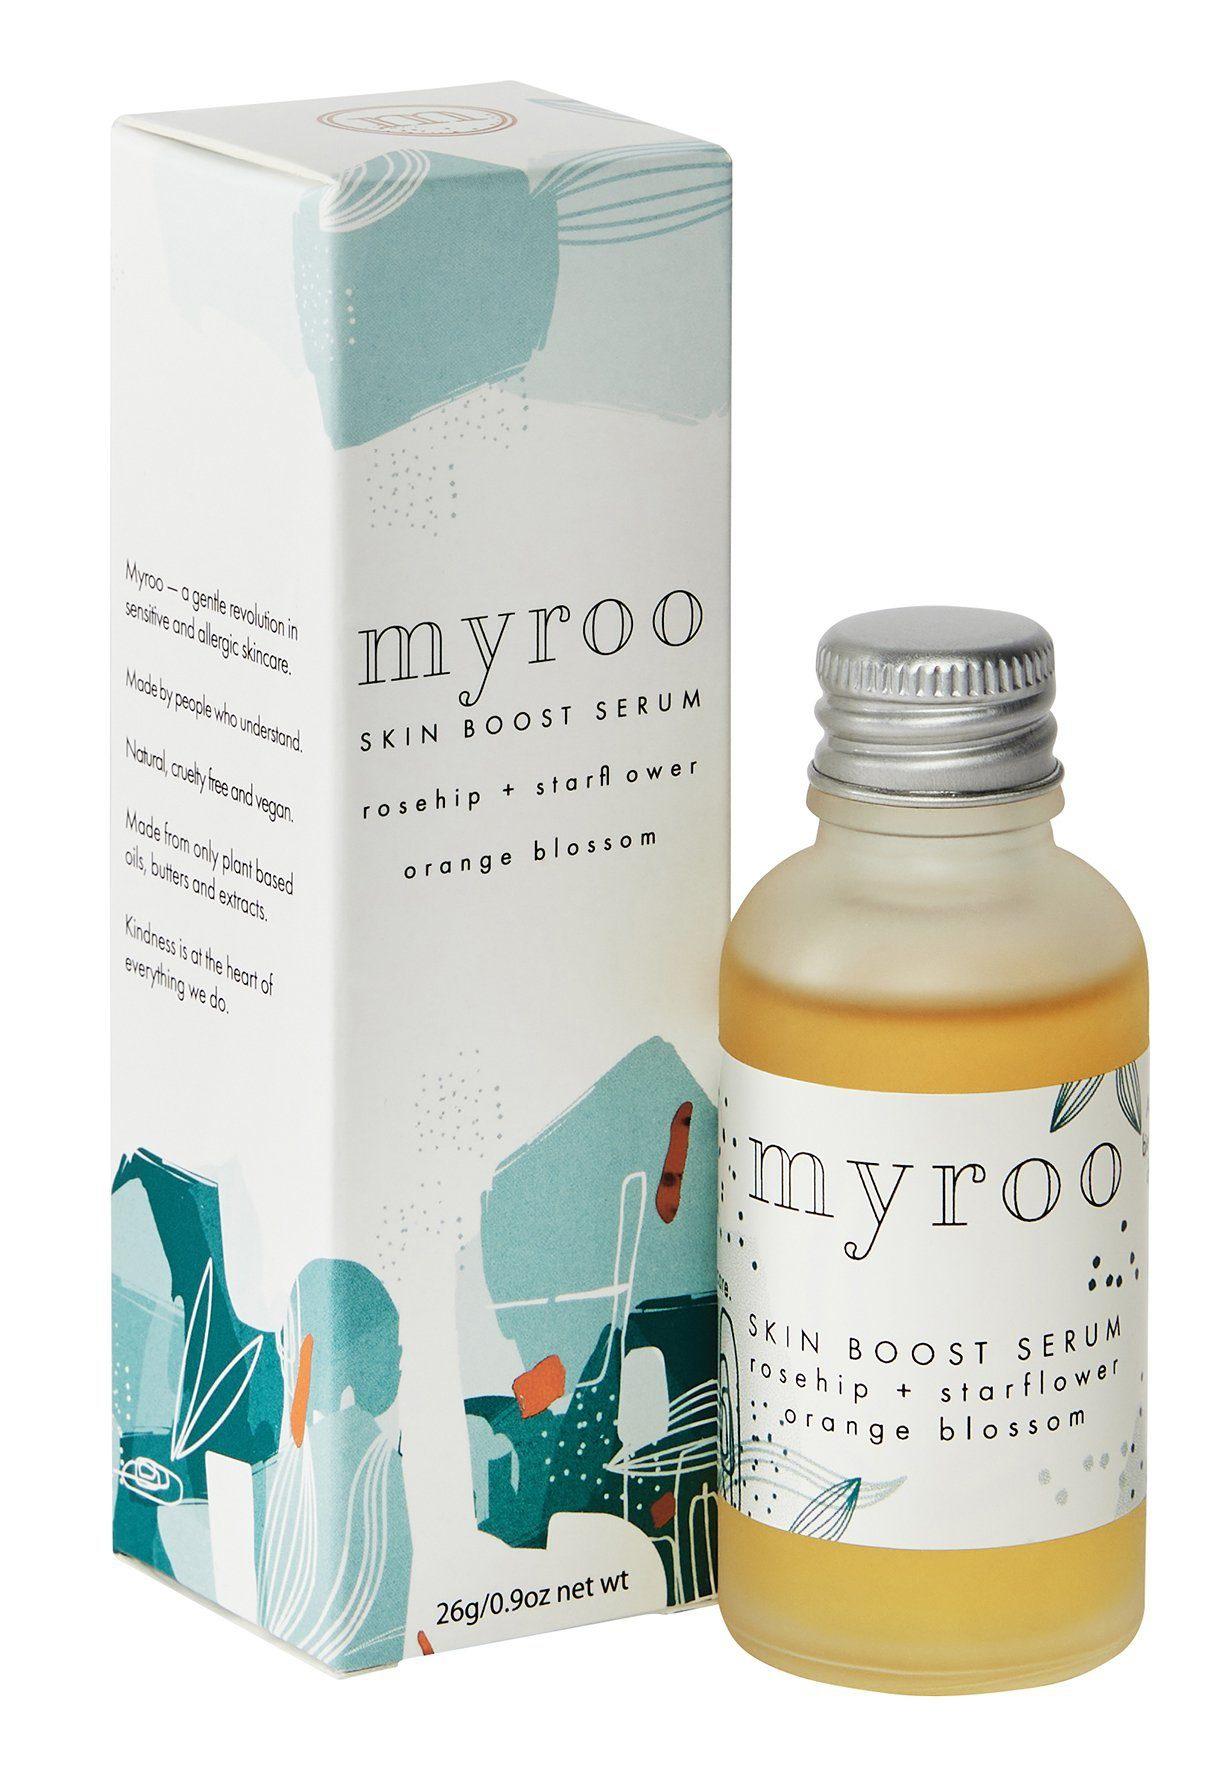 Myroo Skin Boost Serum